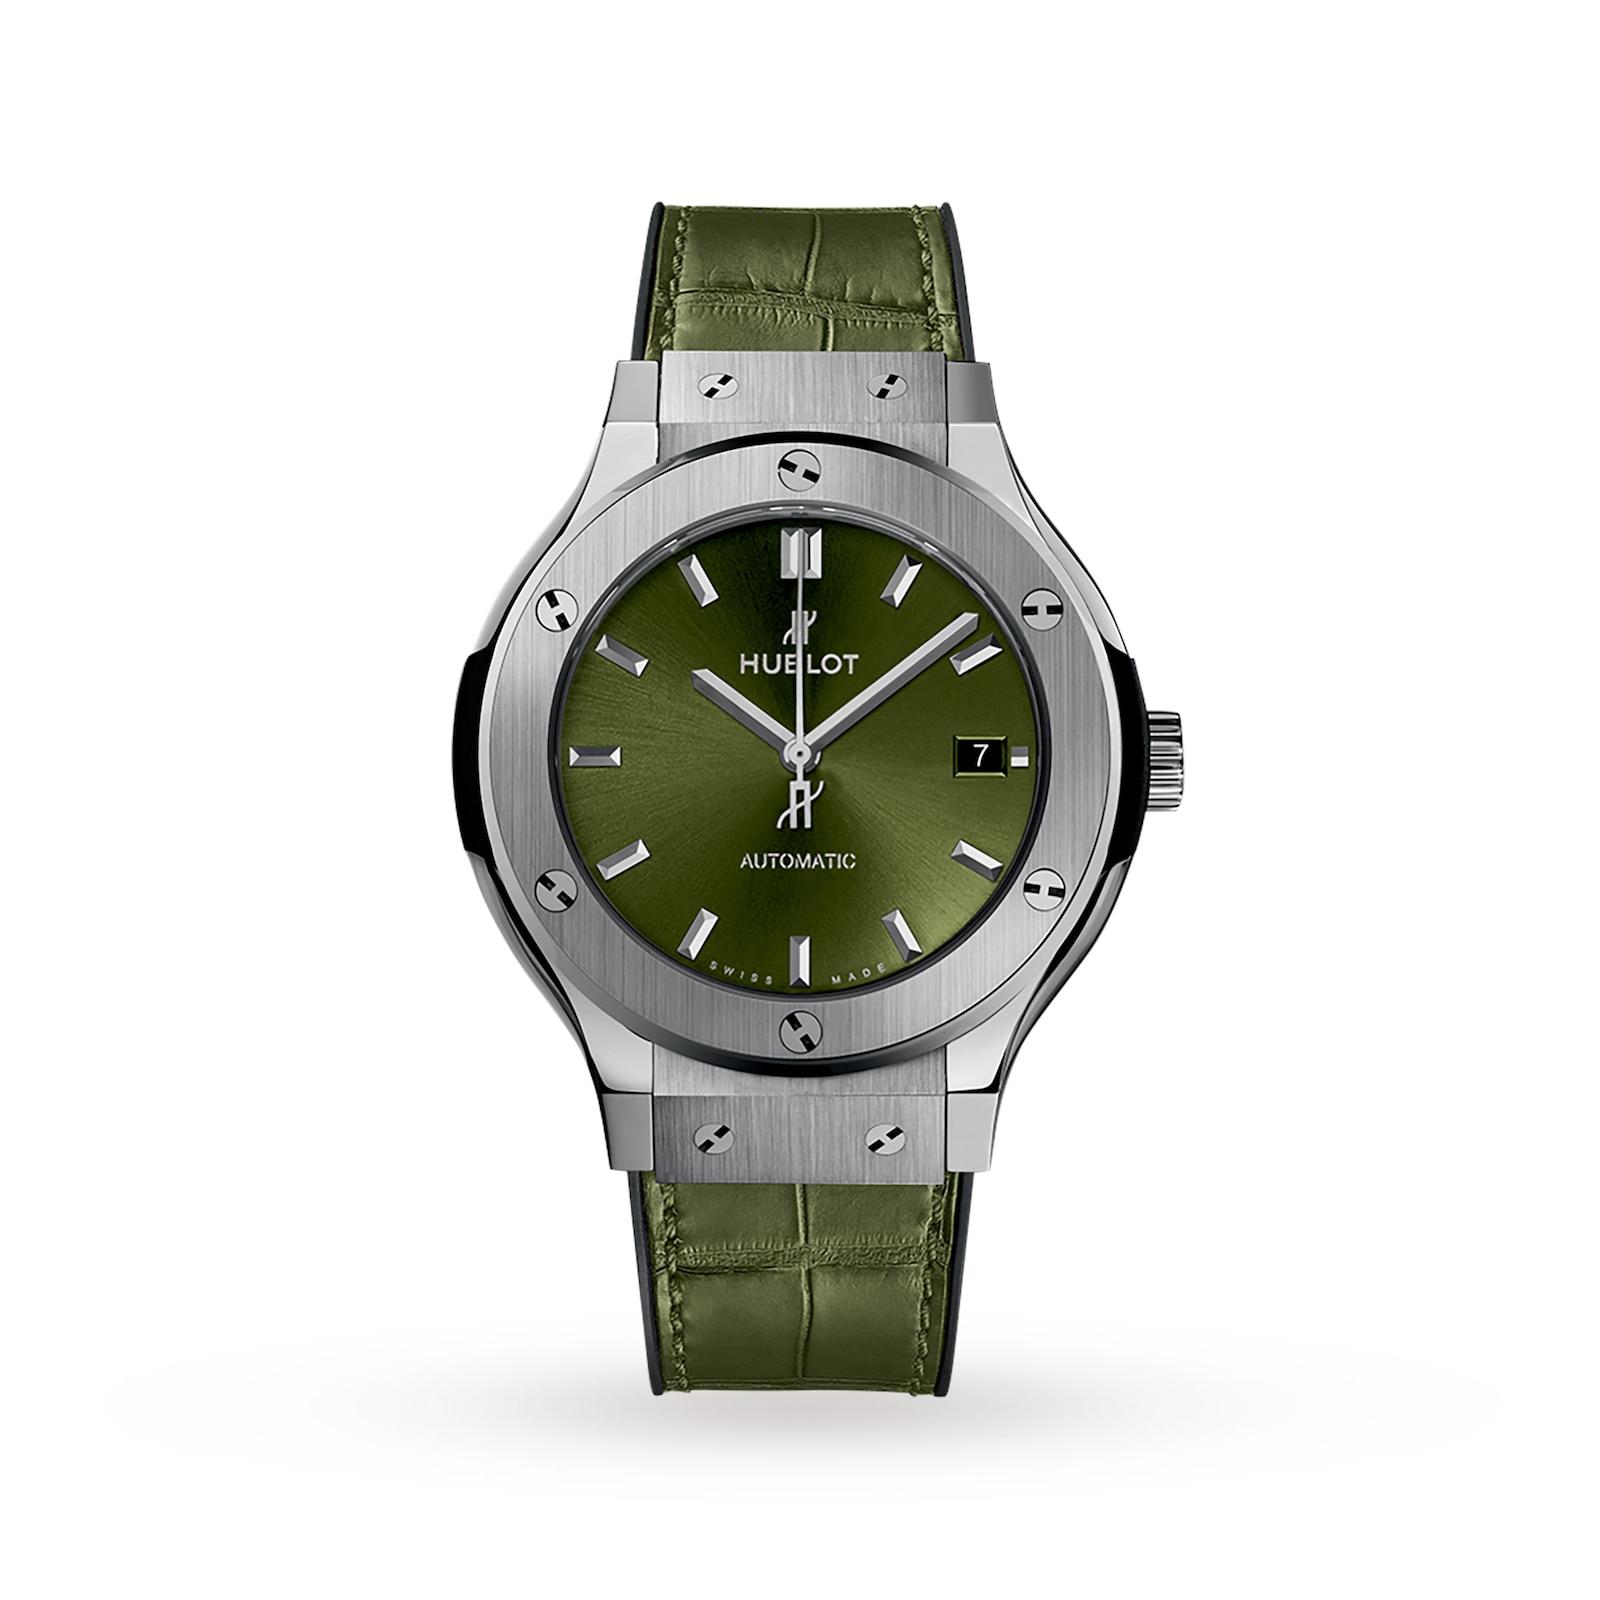 Hublot Hublot Classic Fusion Titanium Green 38mm Ladies Watch